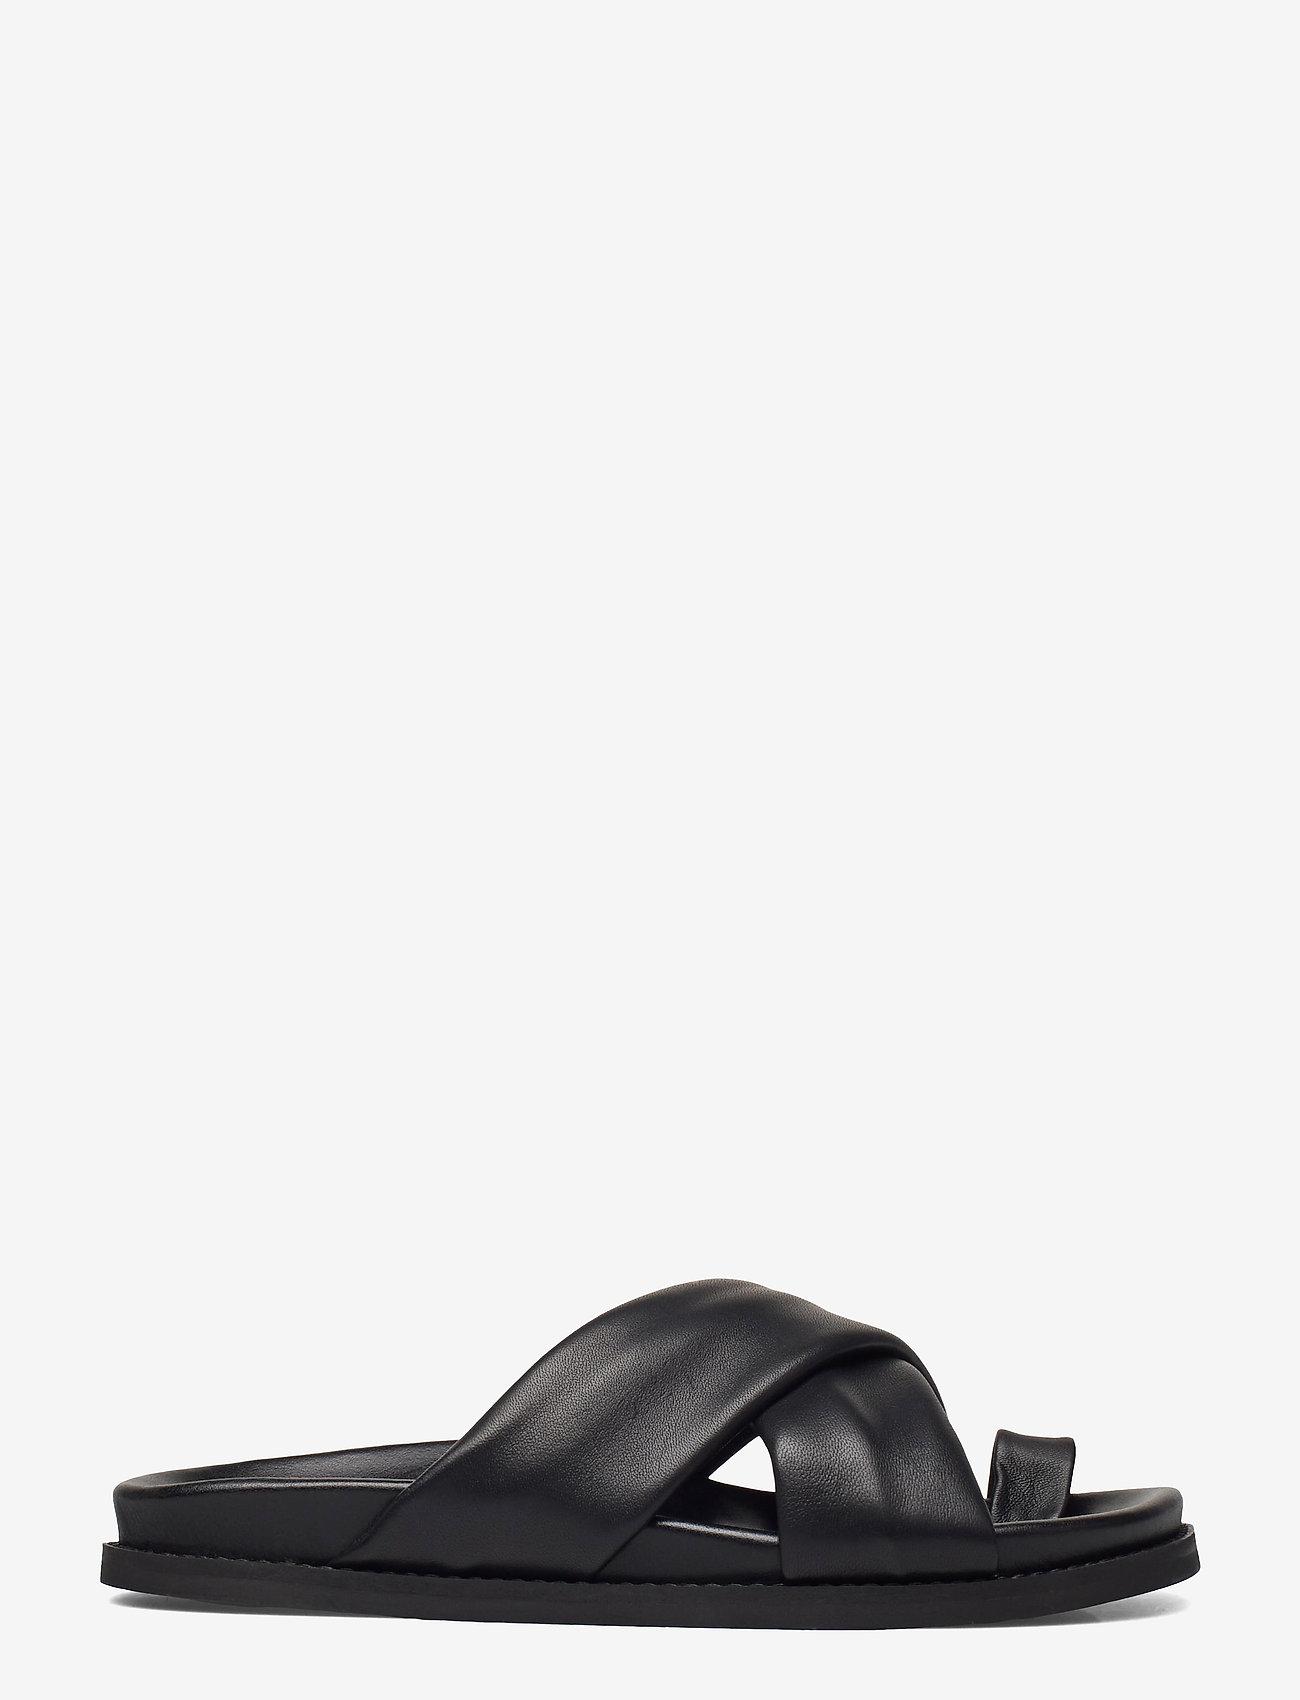 2NDDAY - 2ND Henri - flat sandals - black - 1